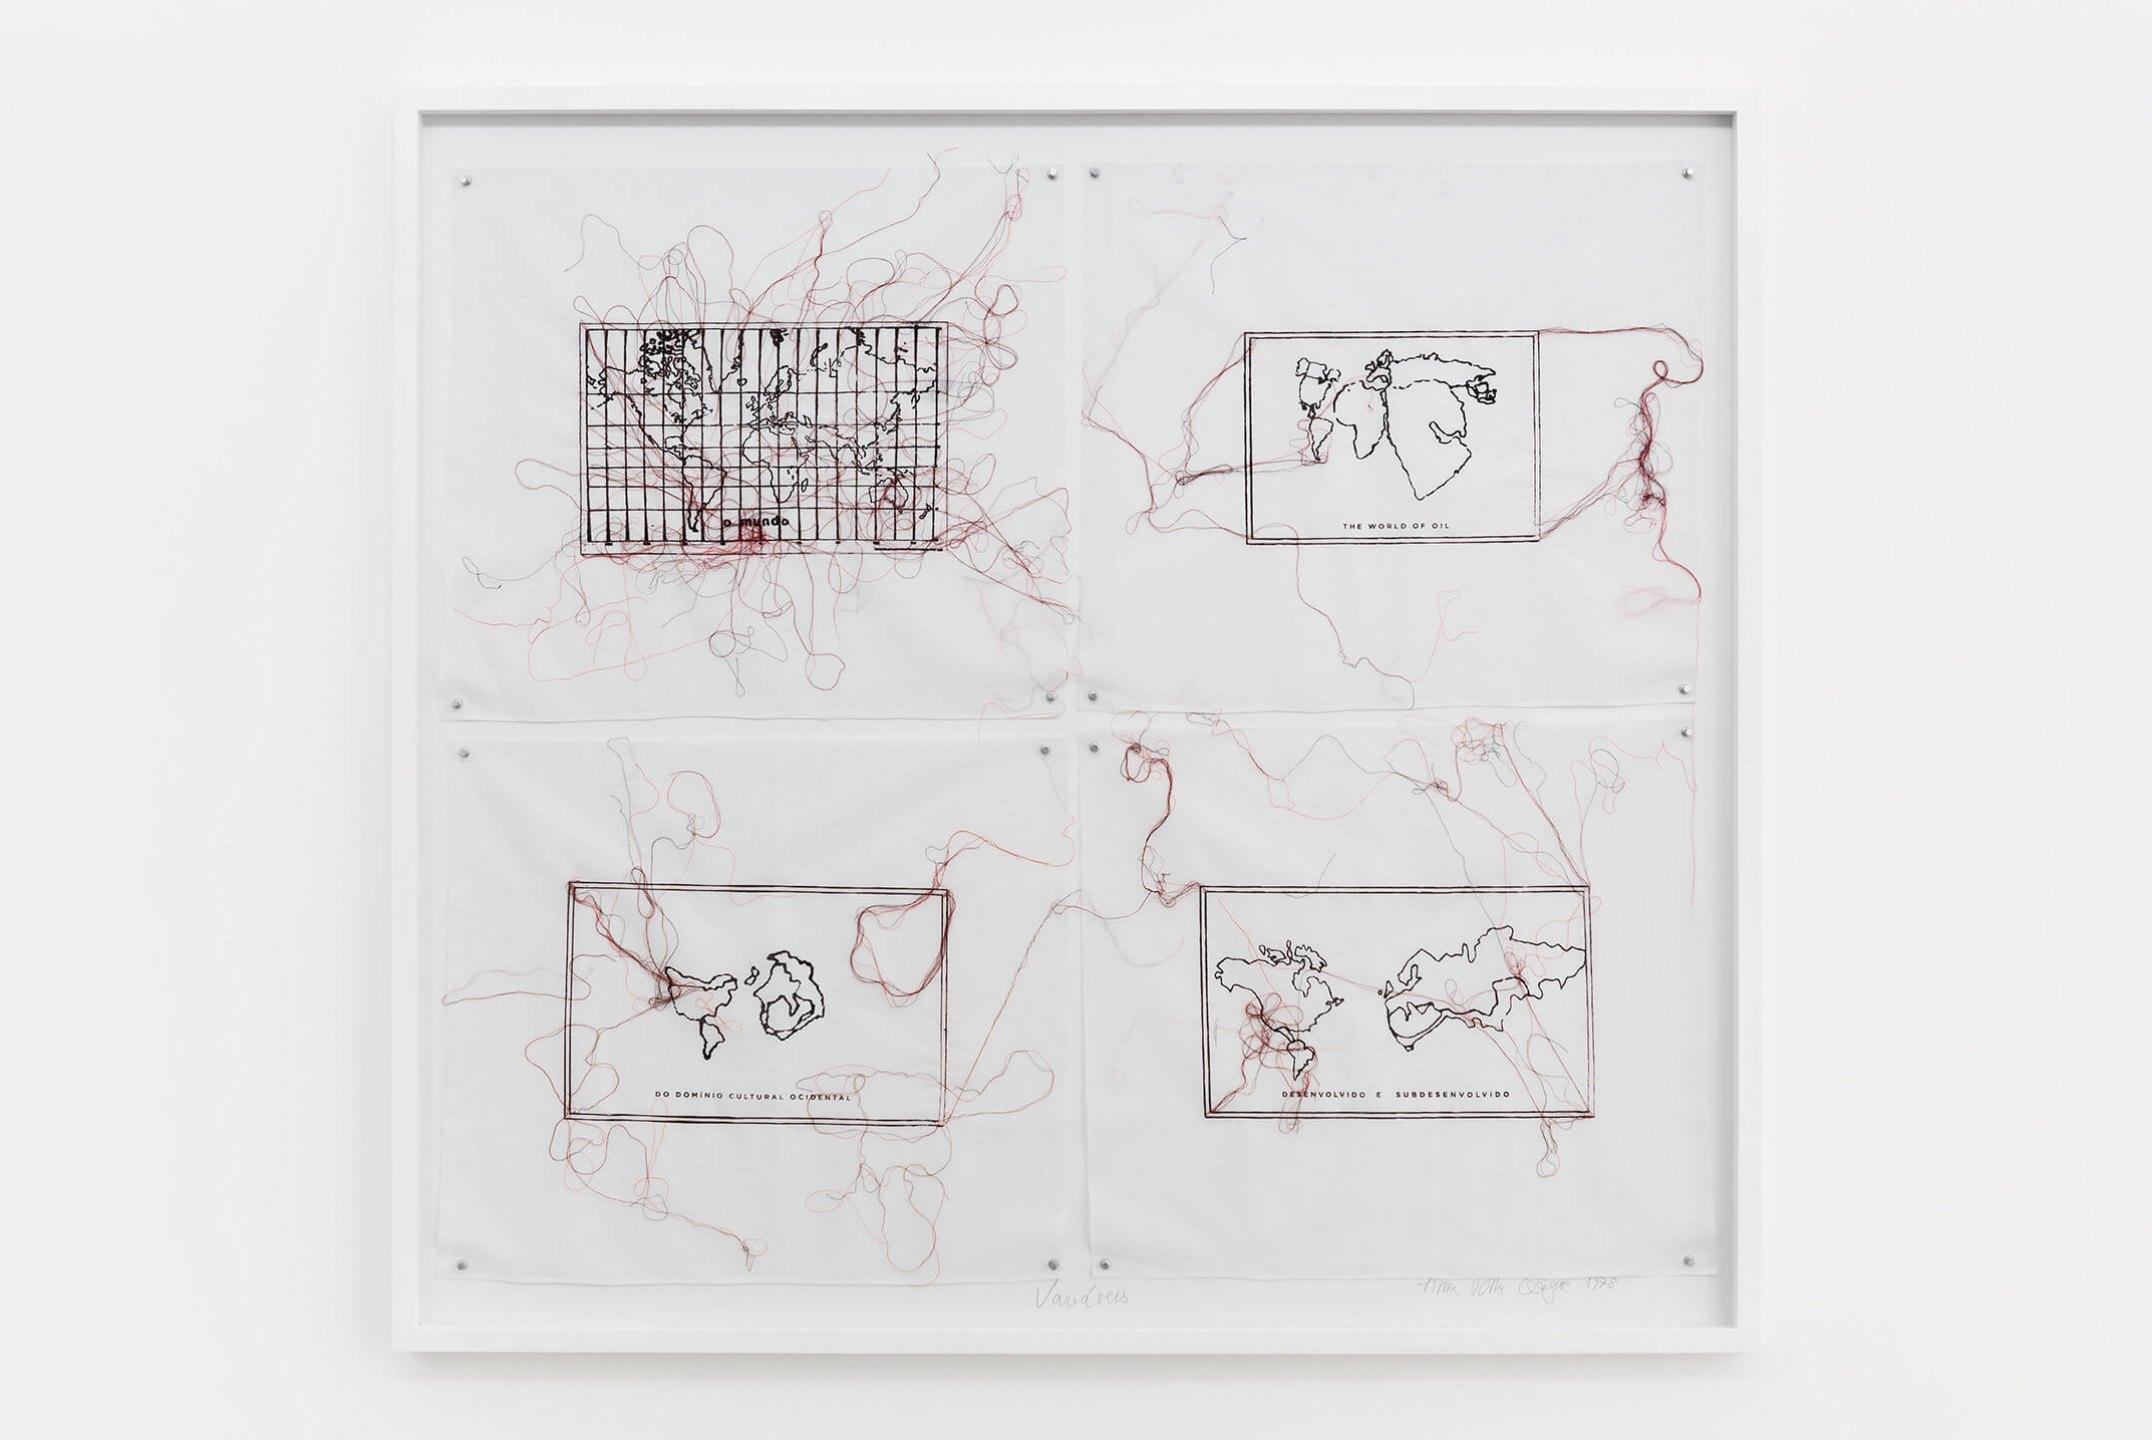 Anna Bella Geiger,<em>Variáveis</em>, 1978/2009, serigraphy and embroidery by machine on linen, 130 × 130 cm - Mendes Wood DM